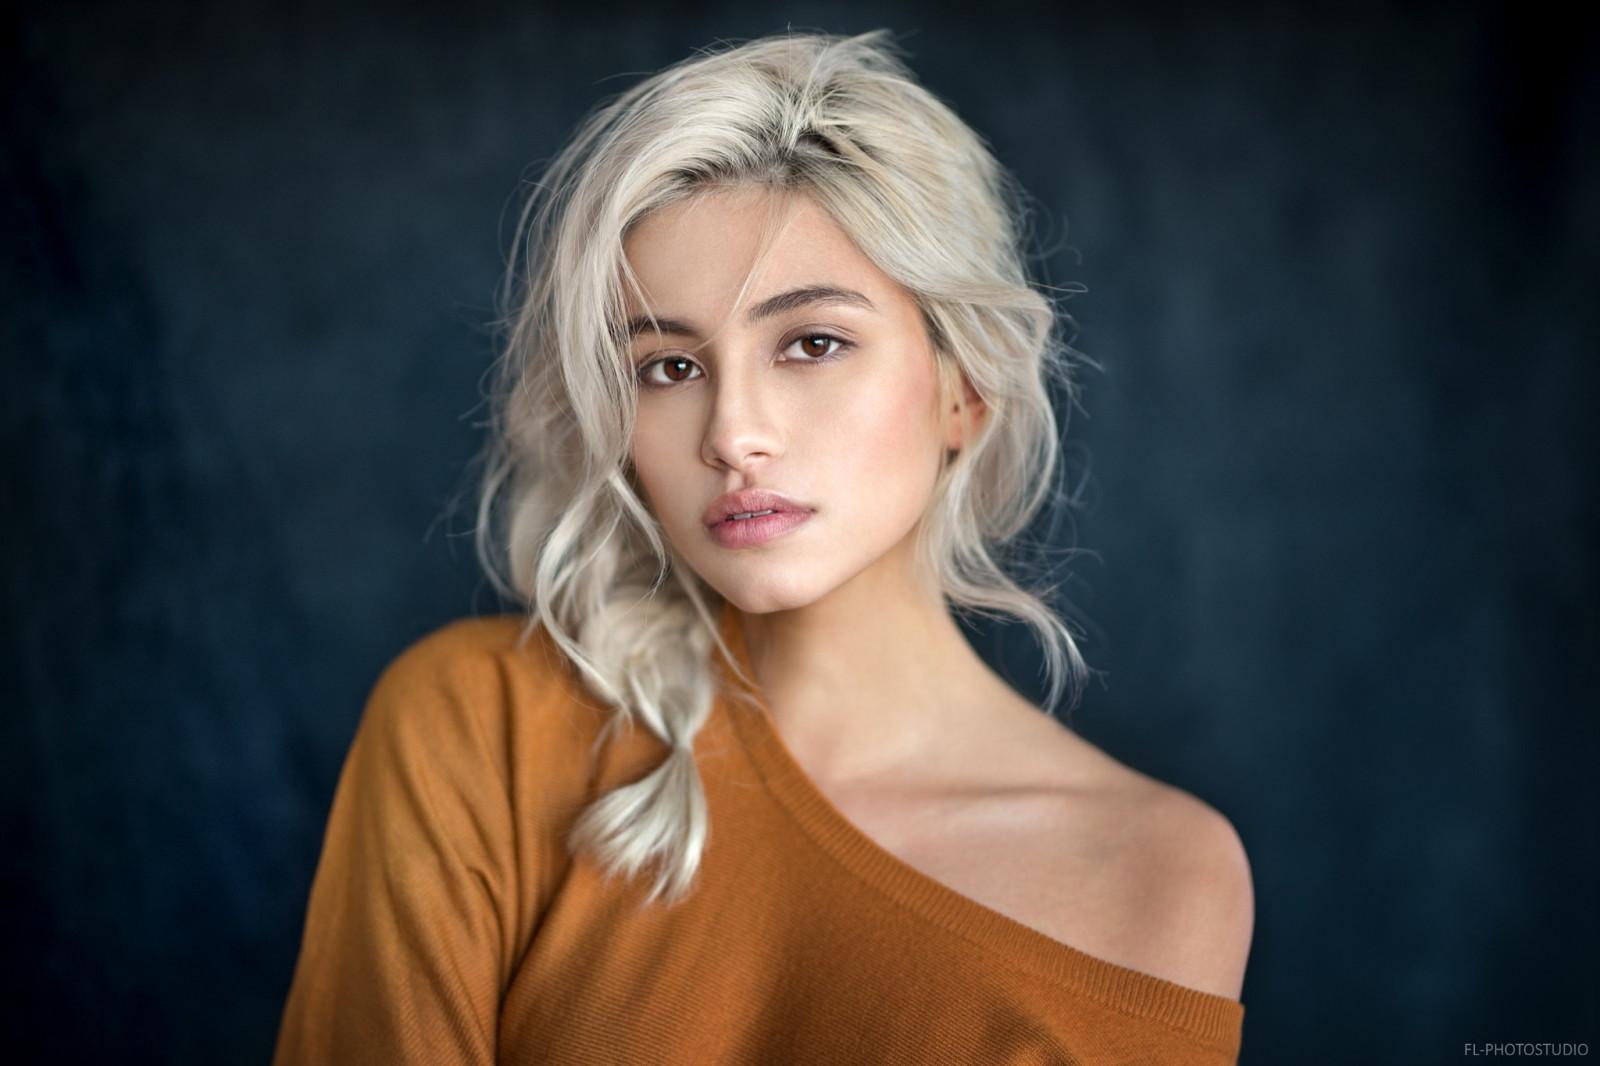 Wallpaper Face Model Blonde Eyes Long Hair Singer: Wallpaper : Face, Women, Blonde, Dyed Hair, Simple